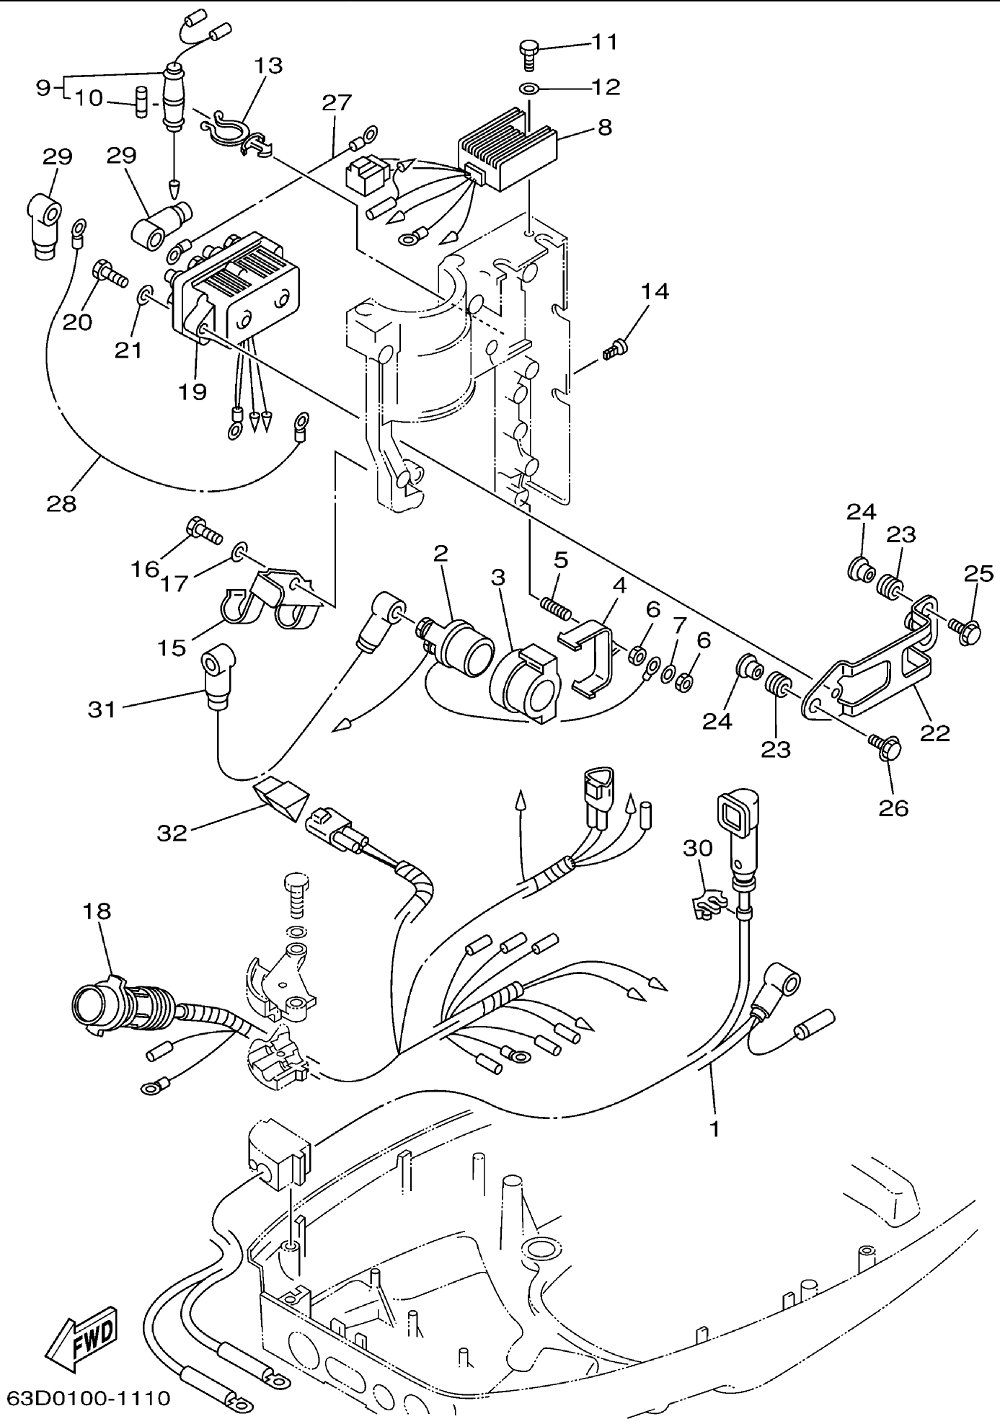 hight resolution of wiring diagram for 40 hp yamaha c40tlryyamaha 40 wiring diagram 21